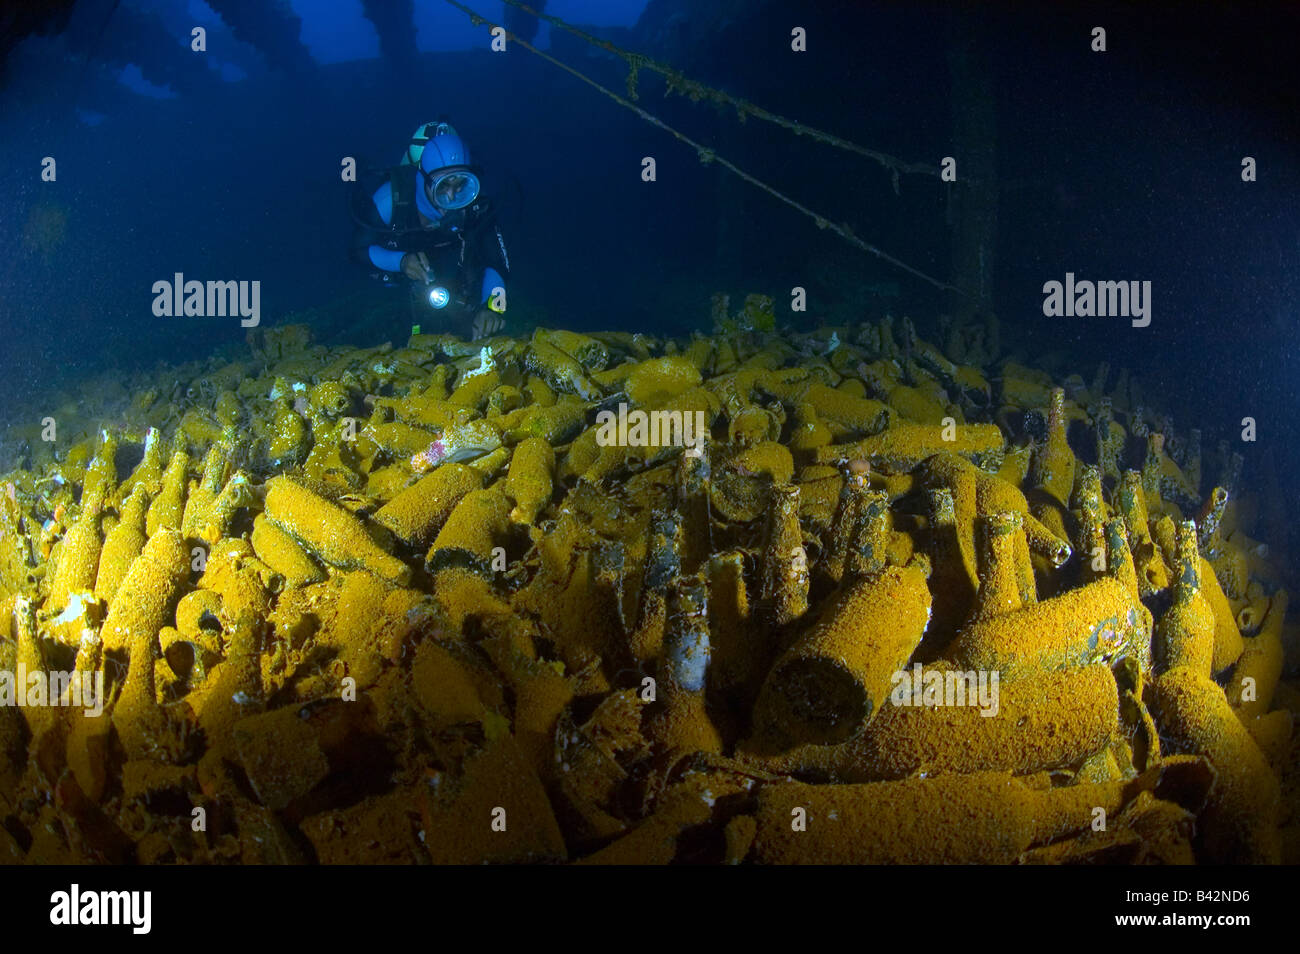 Diver finds stowage with bottles at wreck fujikawa maru truk lagoon caroline islands pacific ocean chuuk